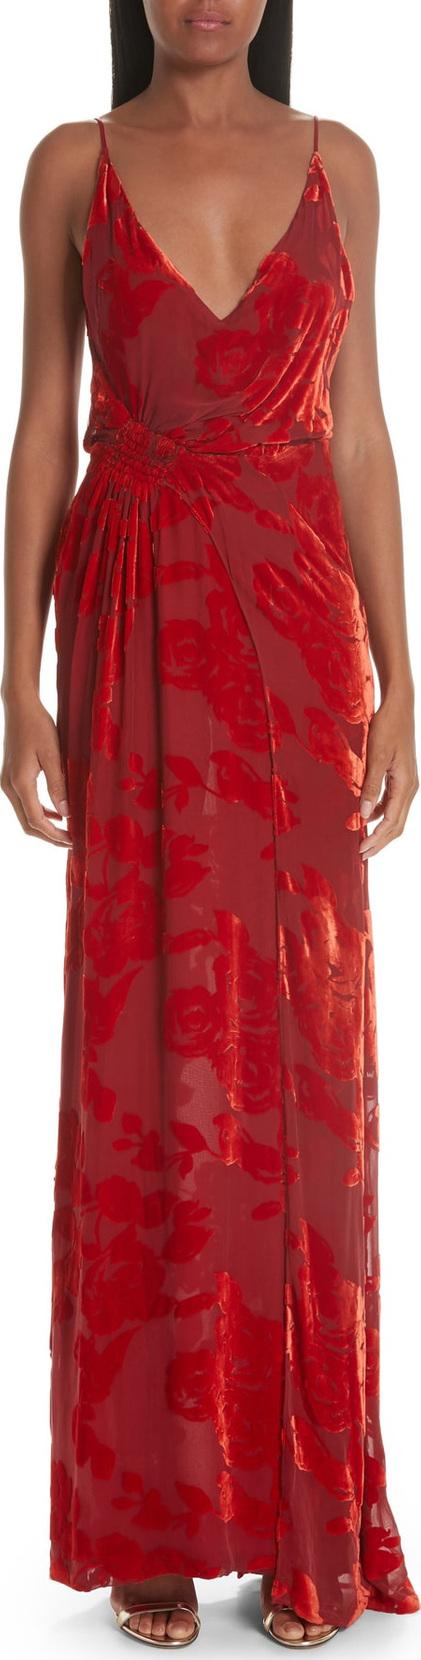 Galvan Rose Velvet Devoré Gown